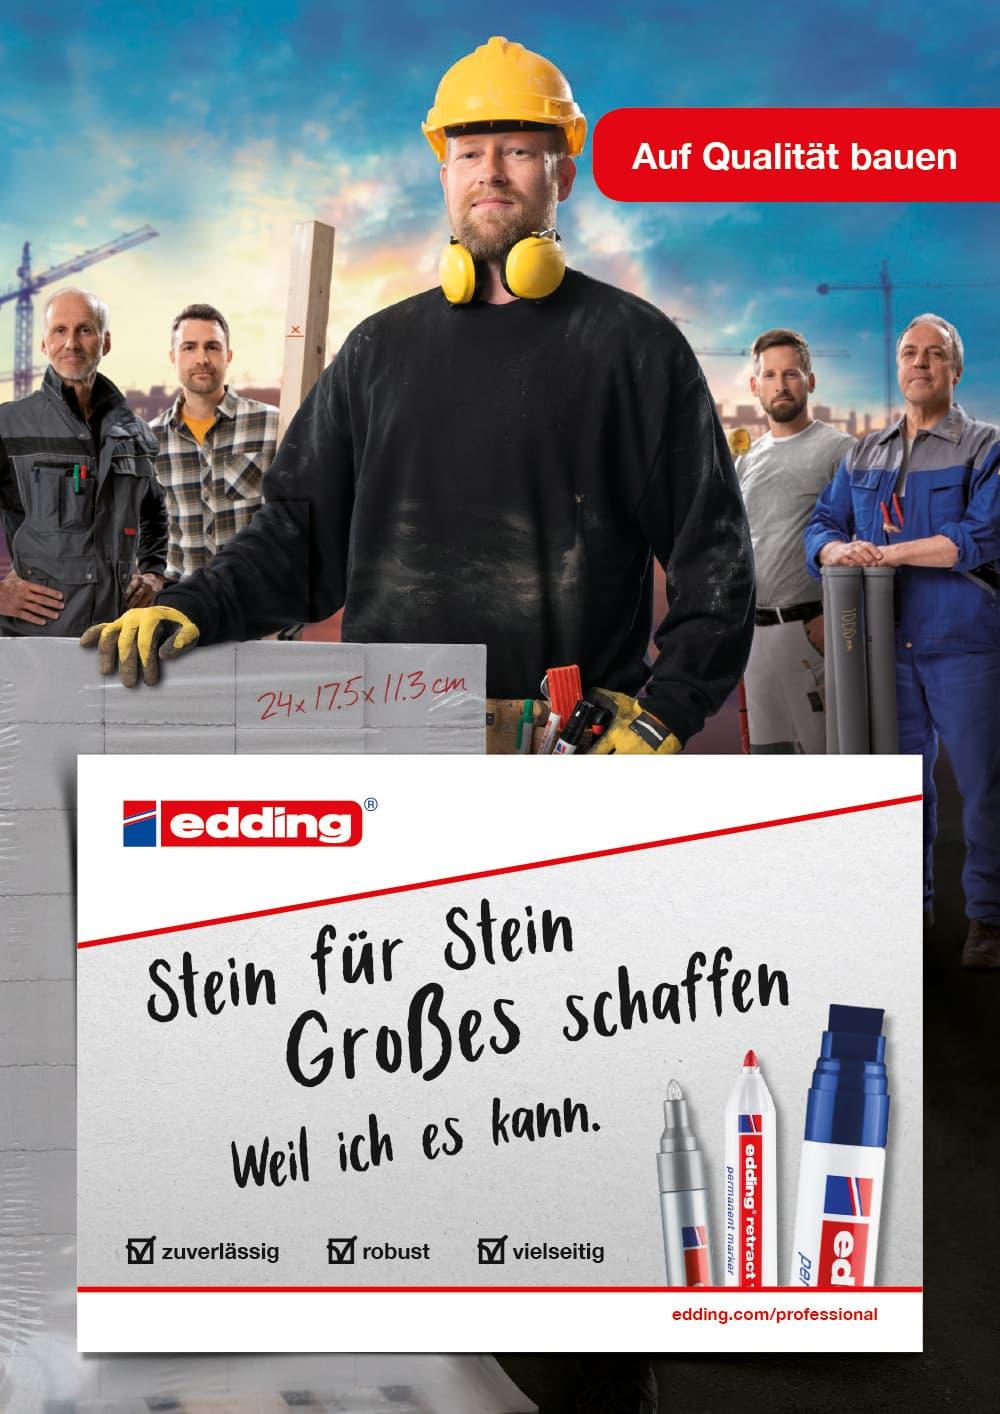 edding Craftsmen Kampagne Motiv Bauarbeiter Hochformat Rückemänner Werbeagentur Hamburg